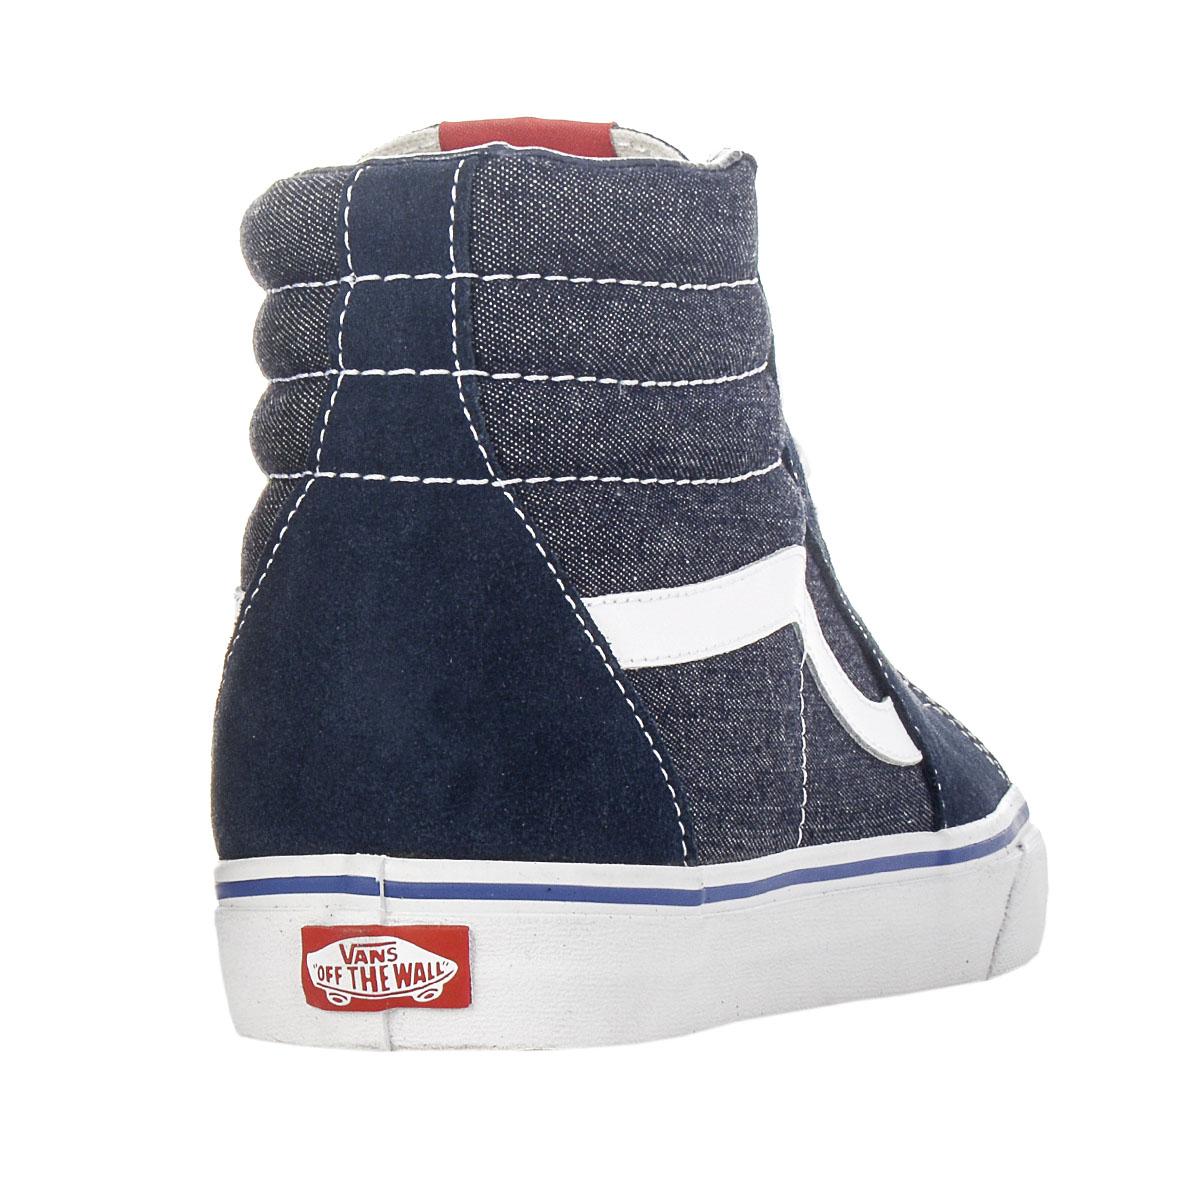 NEU Vans Schuhe SK8 HI Herren Schuhe Vans Navy-Blau VN0KYA7QW SALE 503ed1